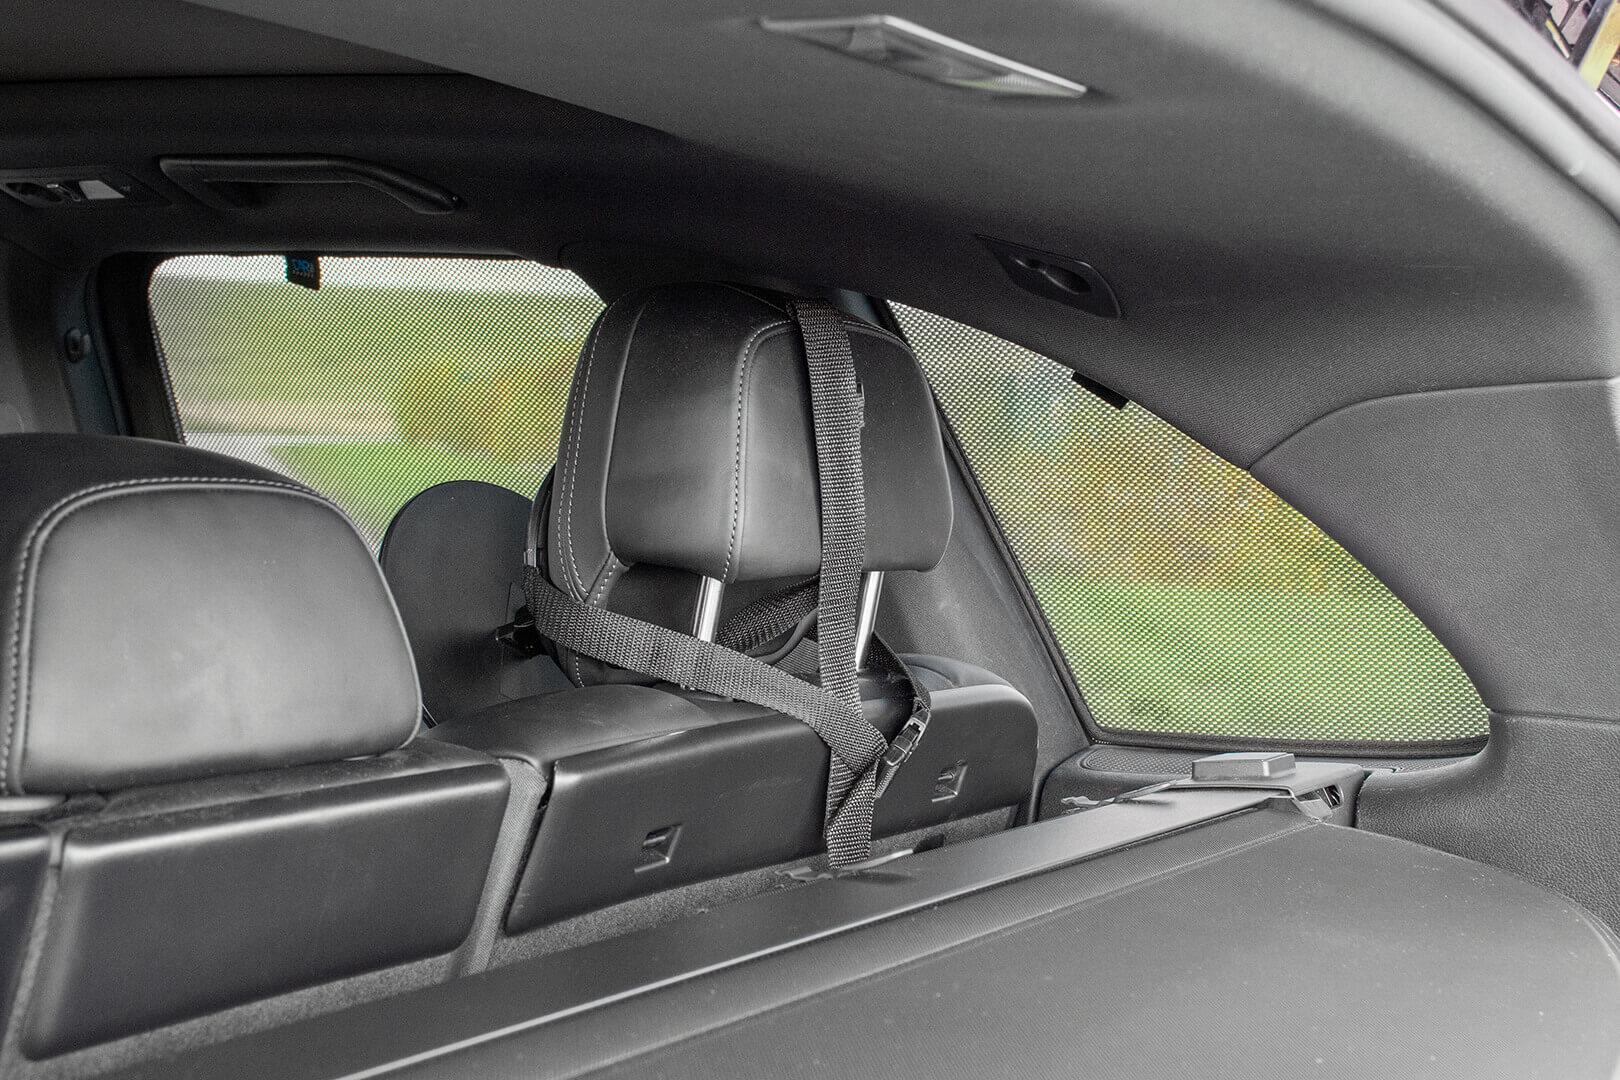 UV Car Shades - Porsche Cayenne 5dr 11-17 Full Rear Set